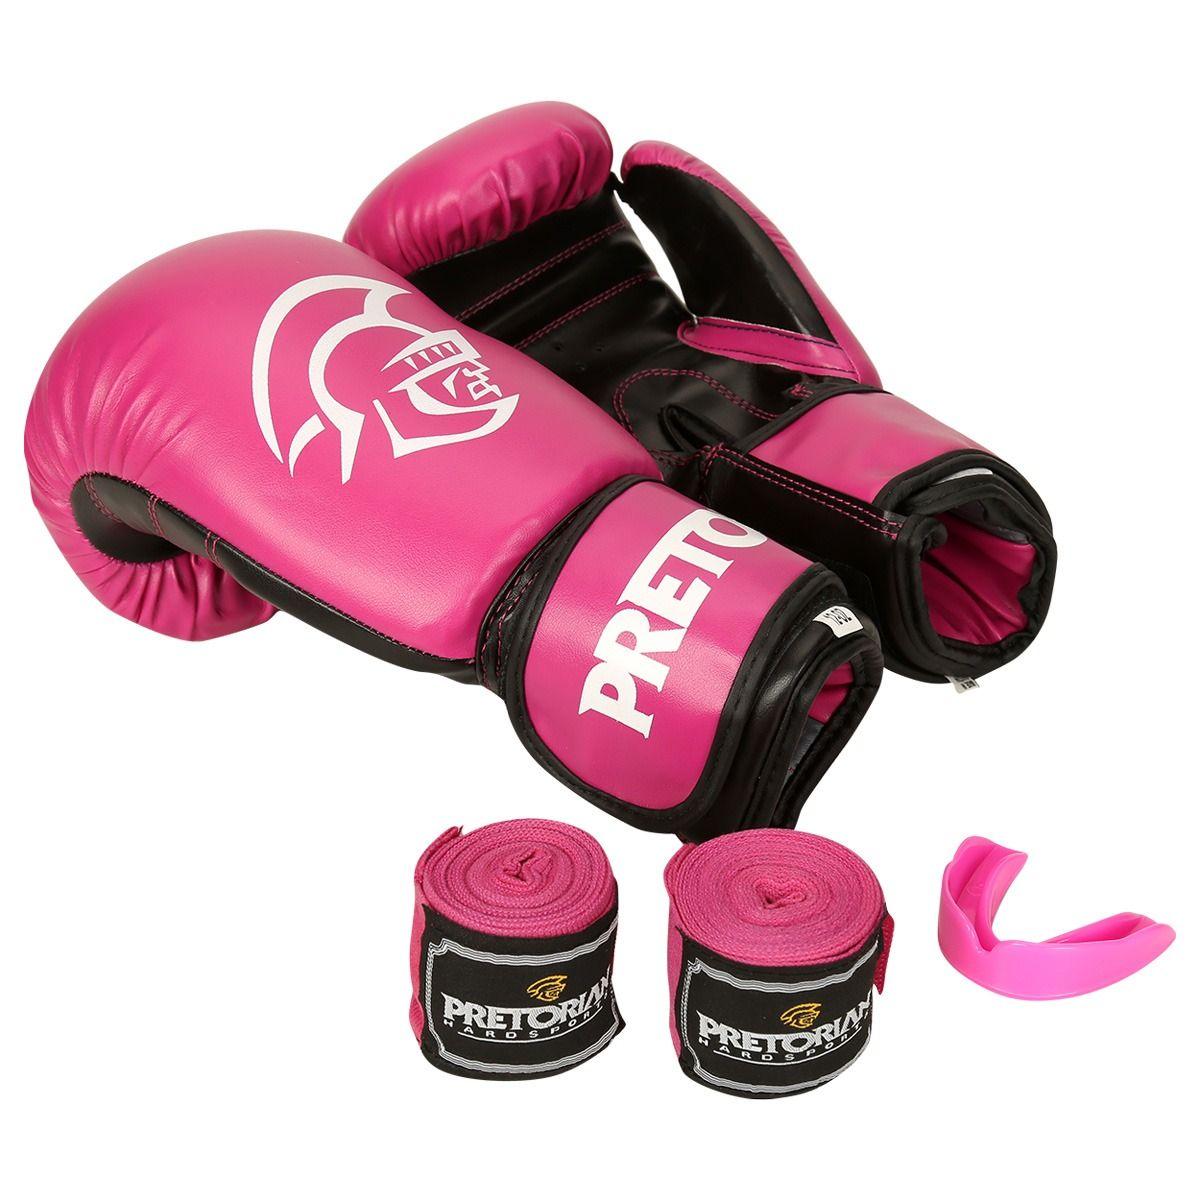 Kit de Boxe / Muay Thai Feminino 12oz - Rosa - First - Pretorian  - PRALUTA SHOP